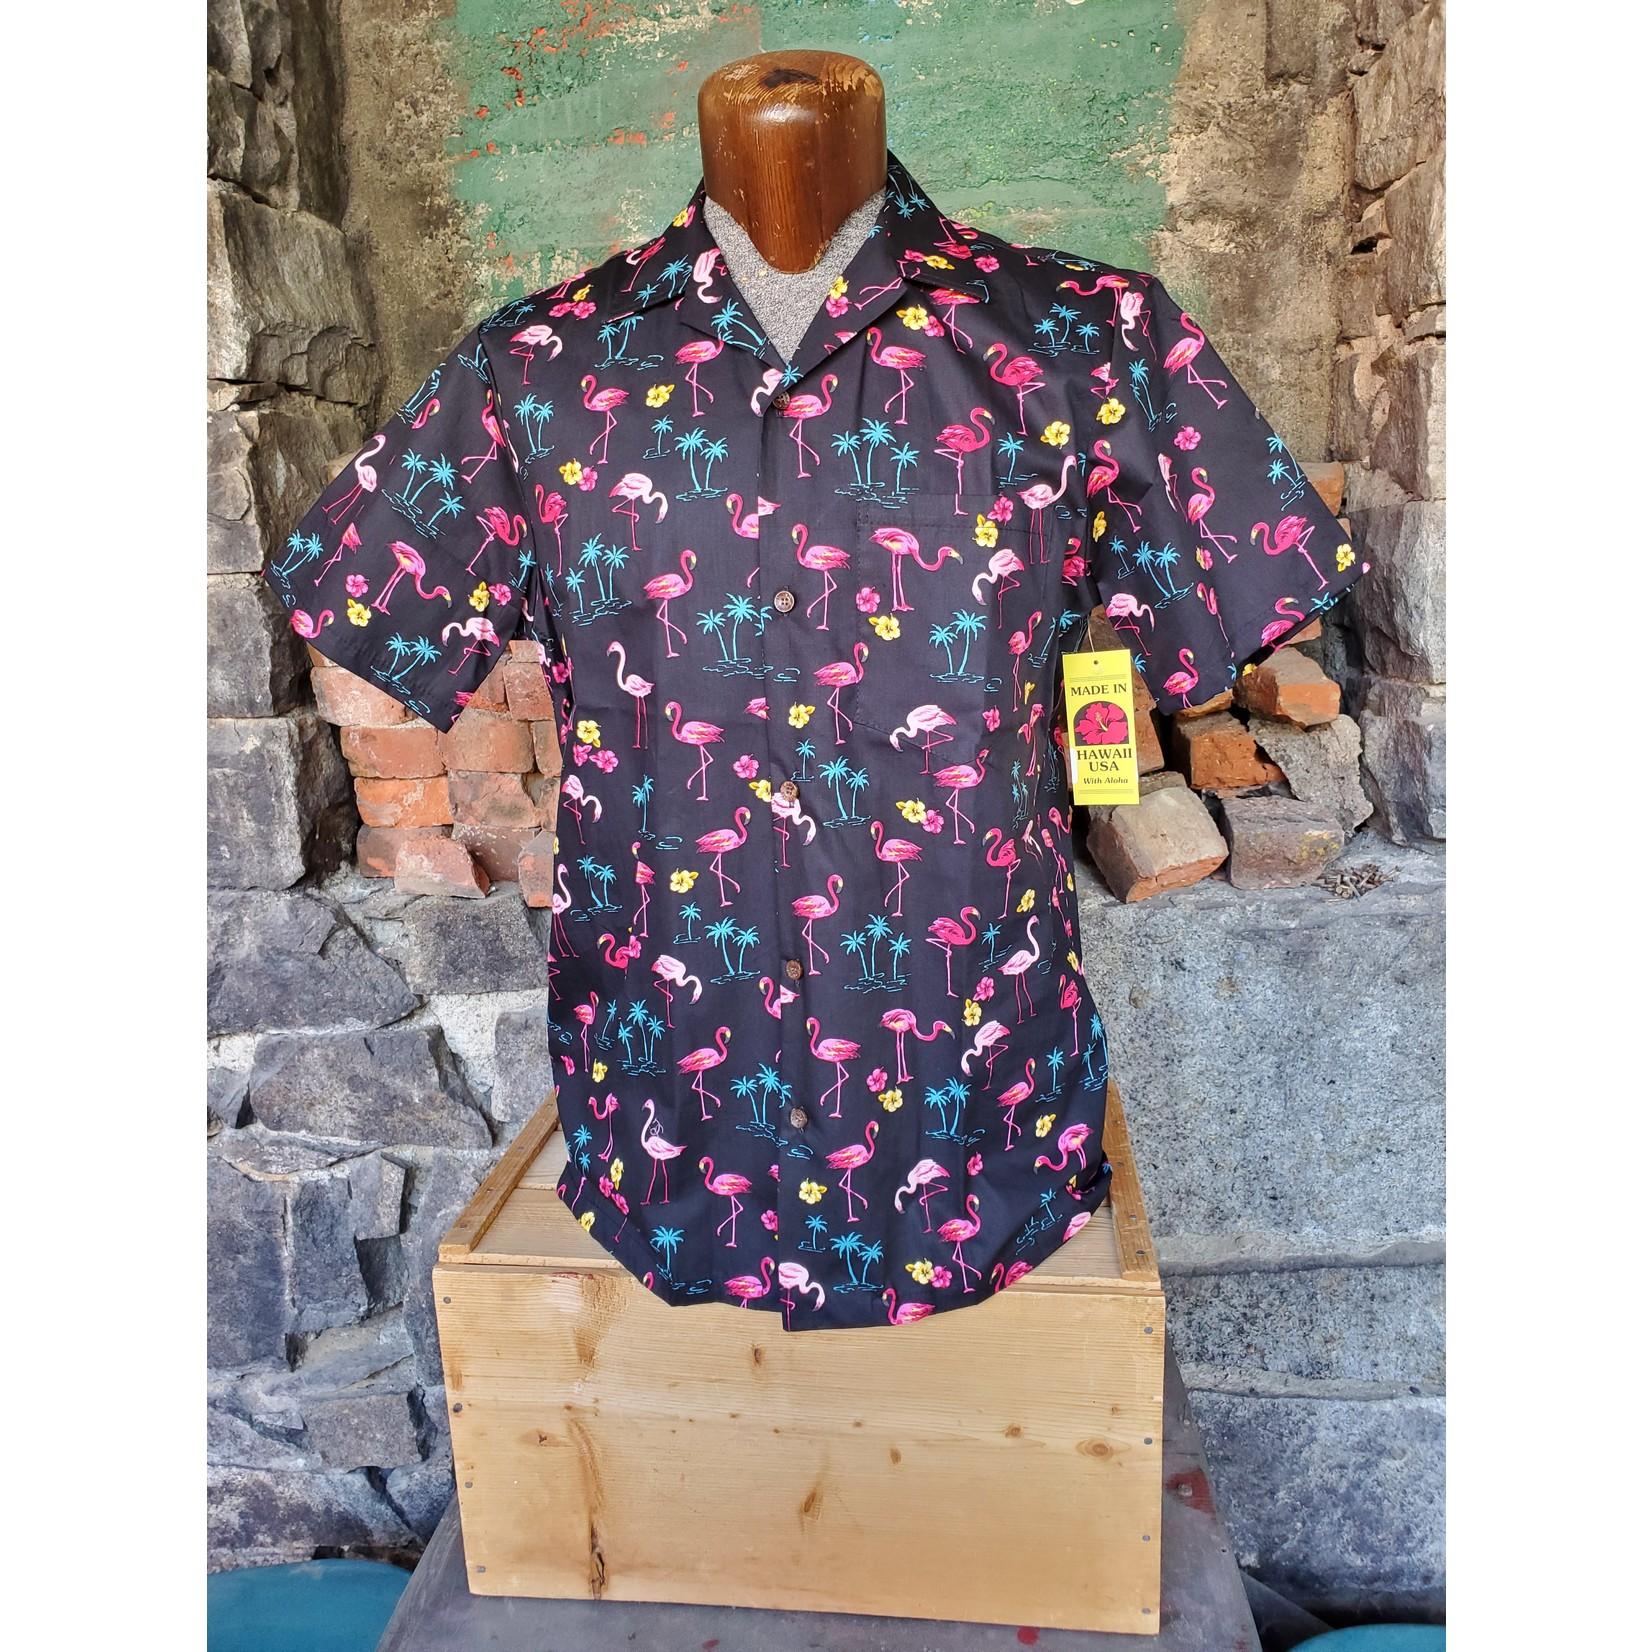 RJC Authentic Hawaiian Shirt - Black Flamingos